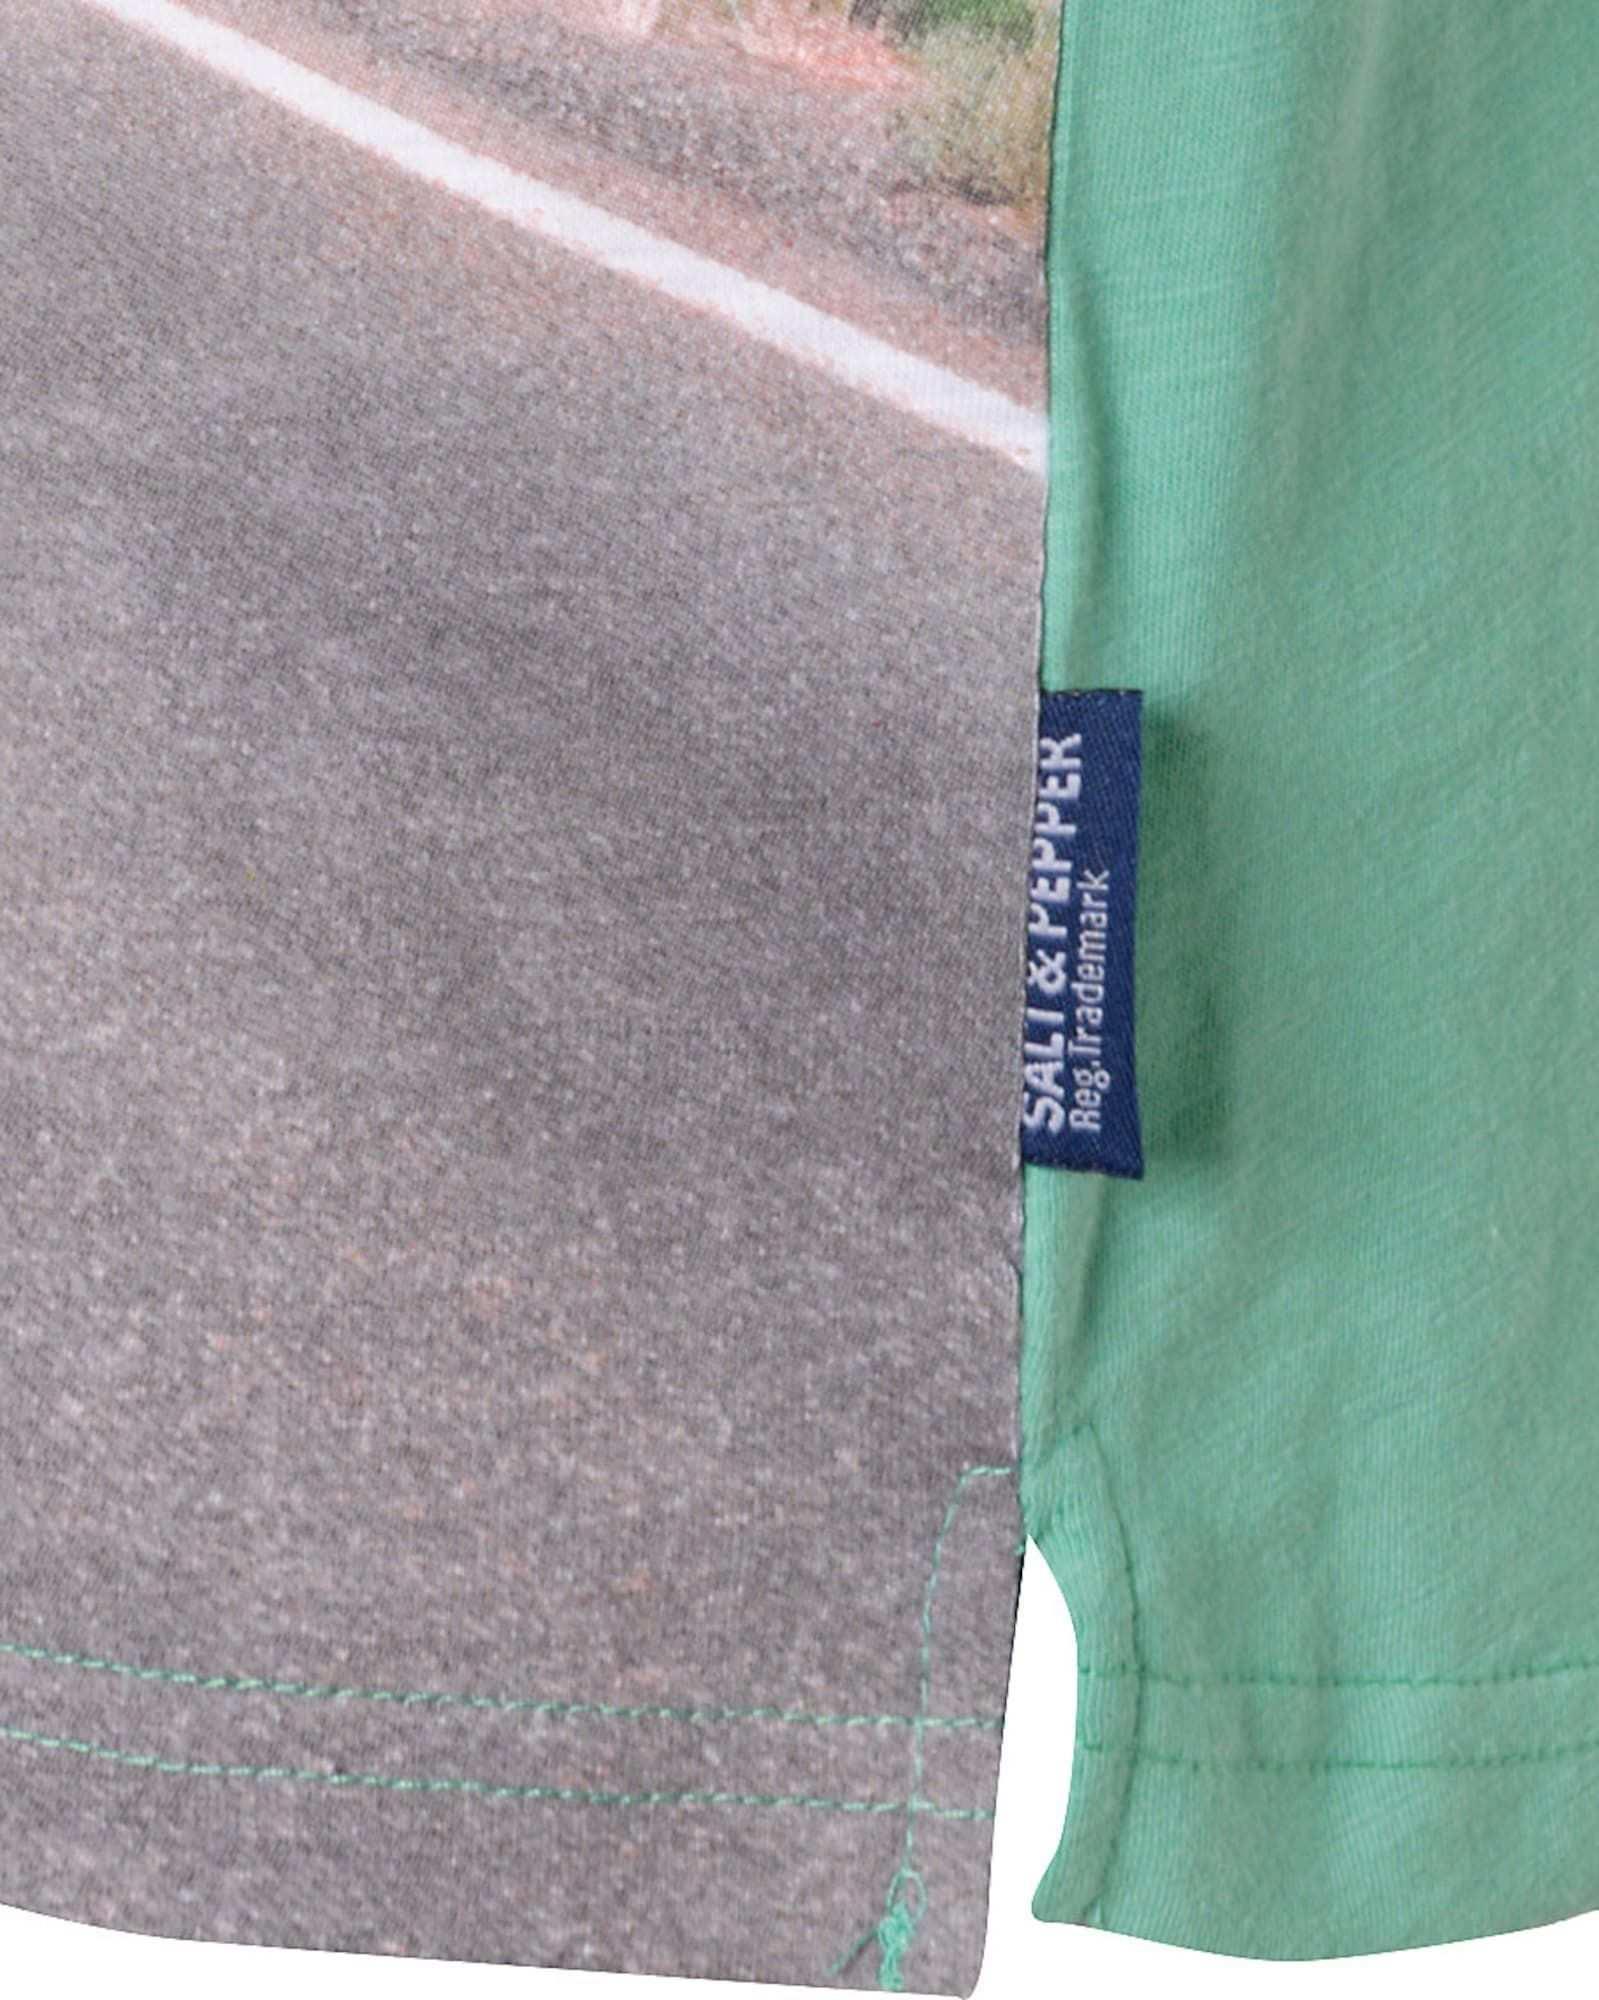 Salz Und Pfeffer T Shirt Motorradjungen Grun Grosse 104 110 In 2020 Shirts T Shirt Marken T Shirts